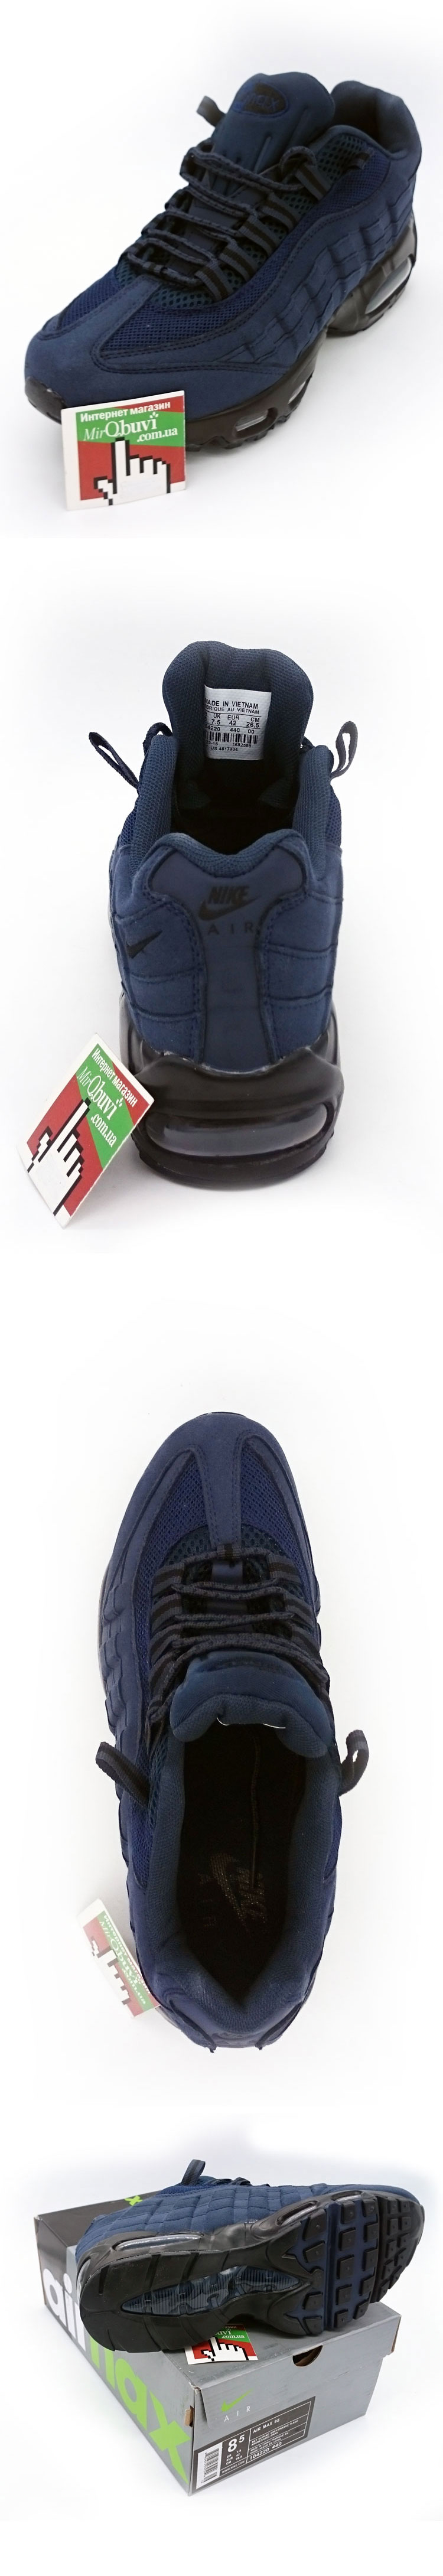 большое фото №5 Мужские кроссовки Nike air max 95 темно синие. ТОП КАЧЕСТВО!!!